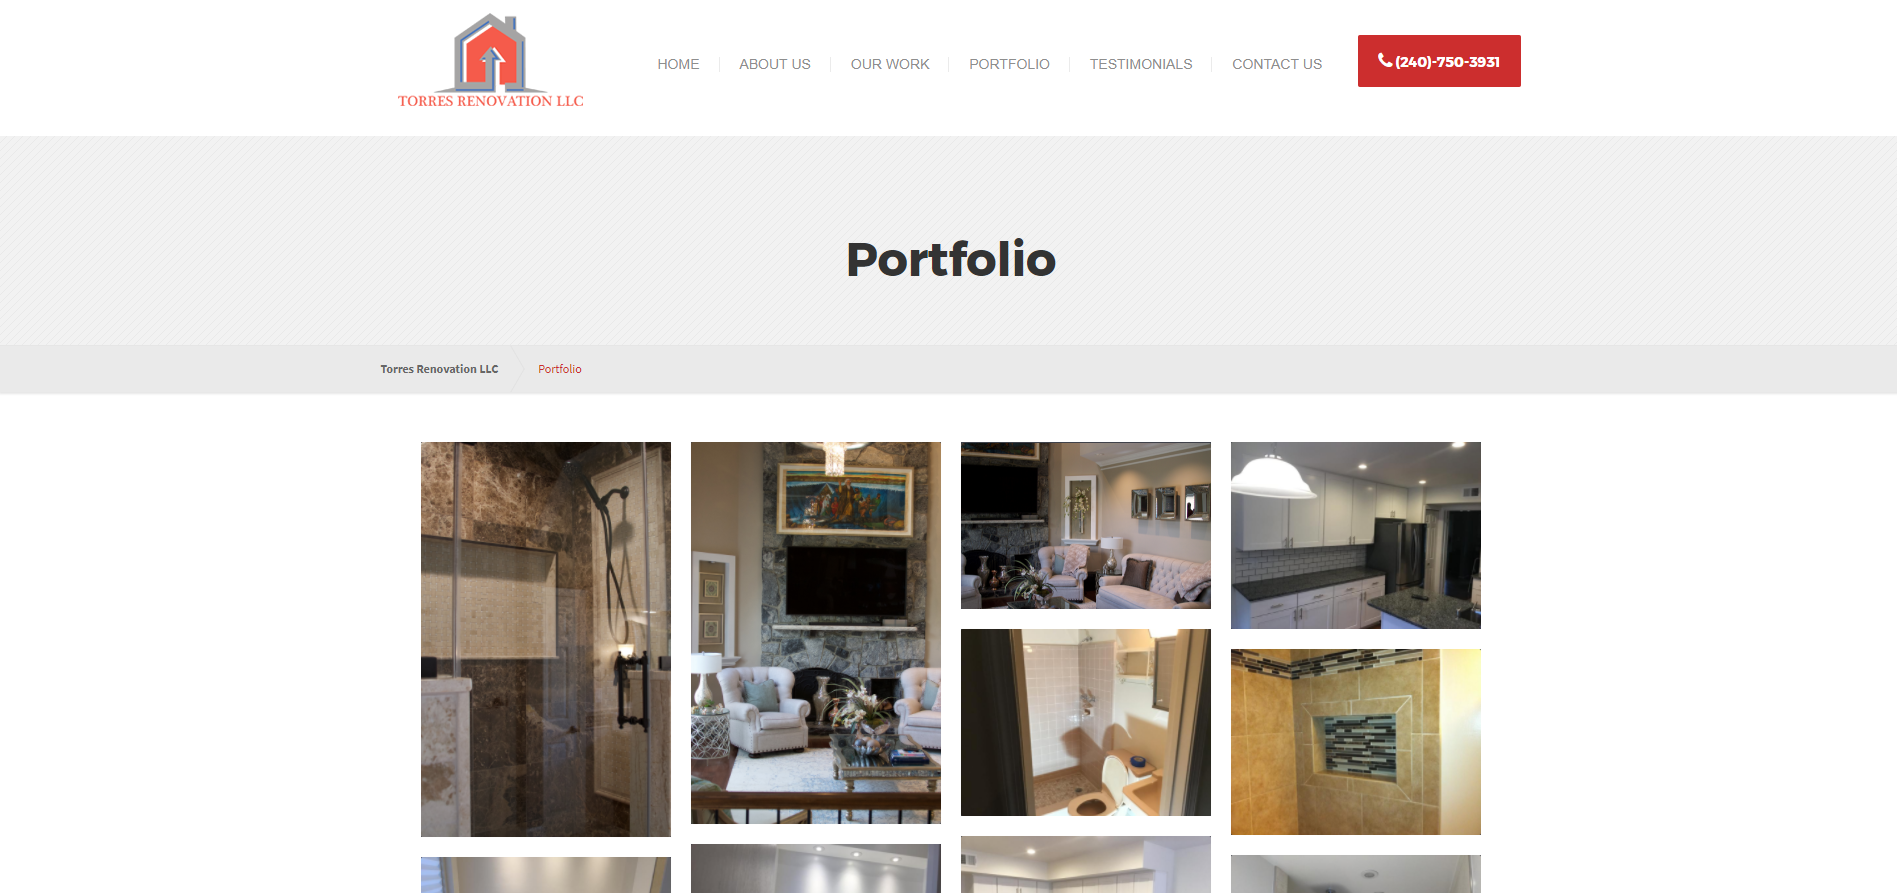 Torres-Renovations-portfolio